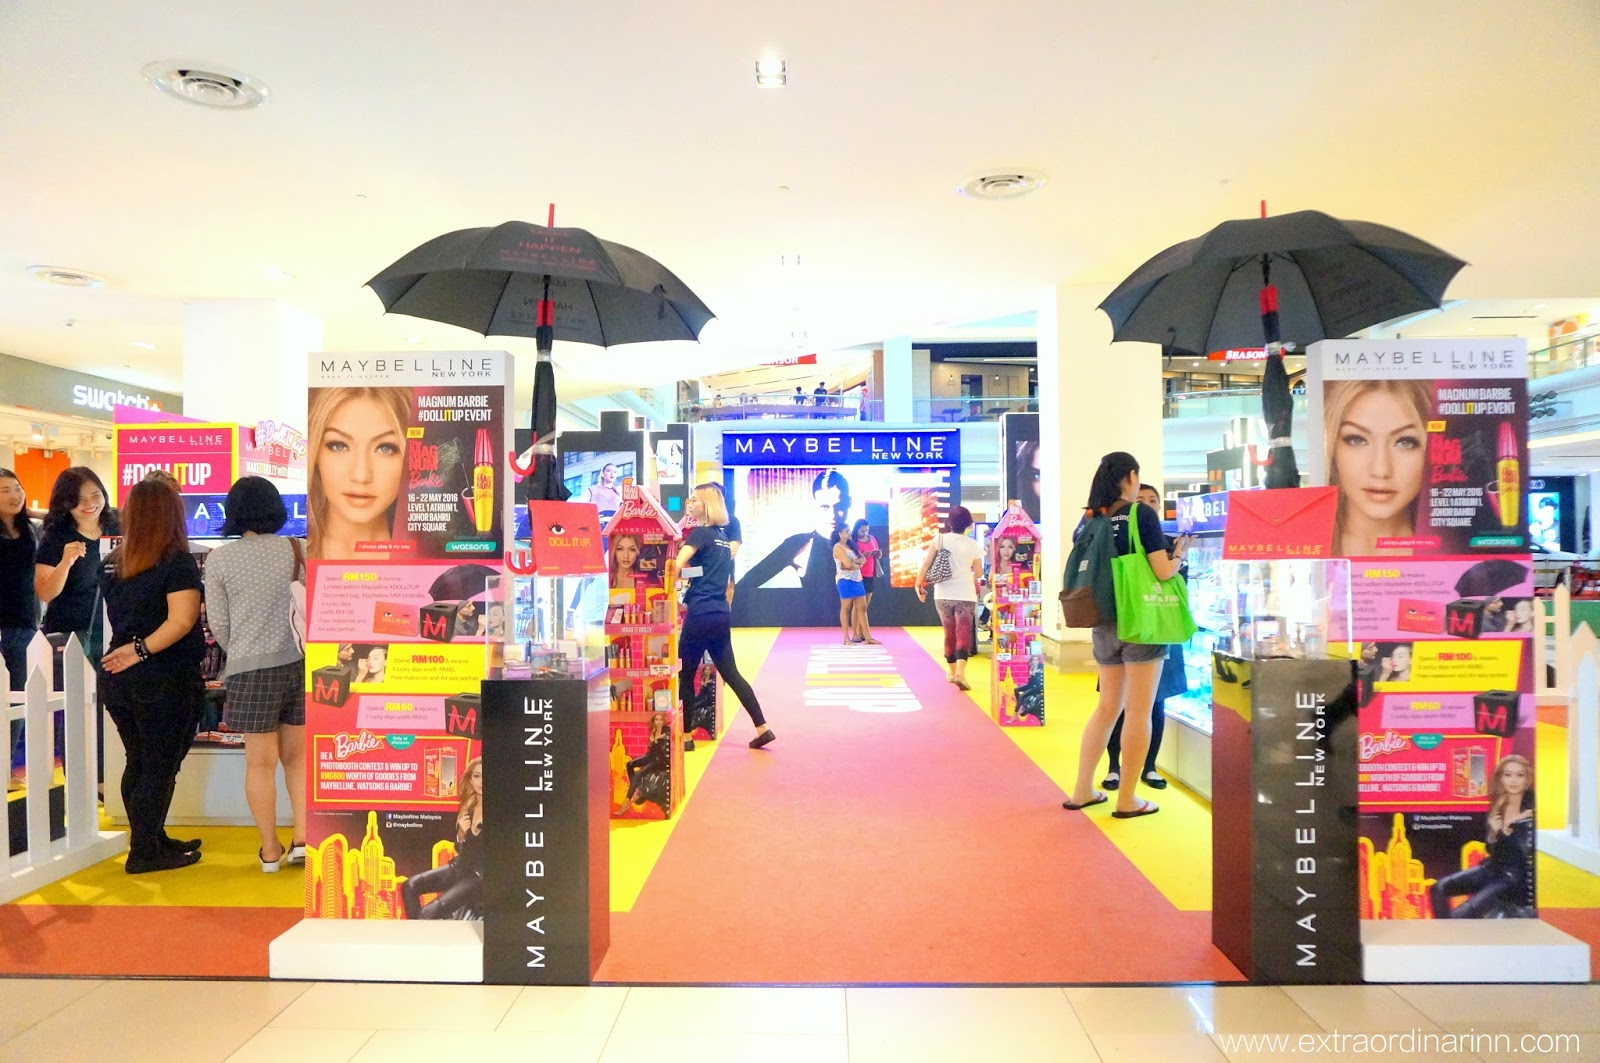 2099e3c8779 Carinn; carerynn | Malaysia Fashion, Beauty & Lifestyle Blog: Event ...